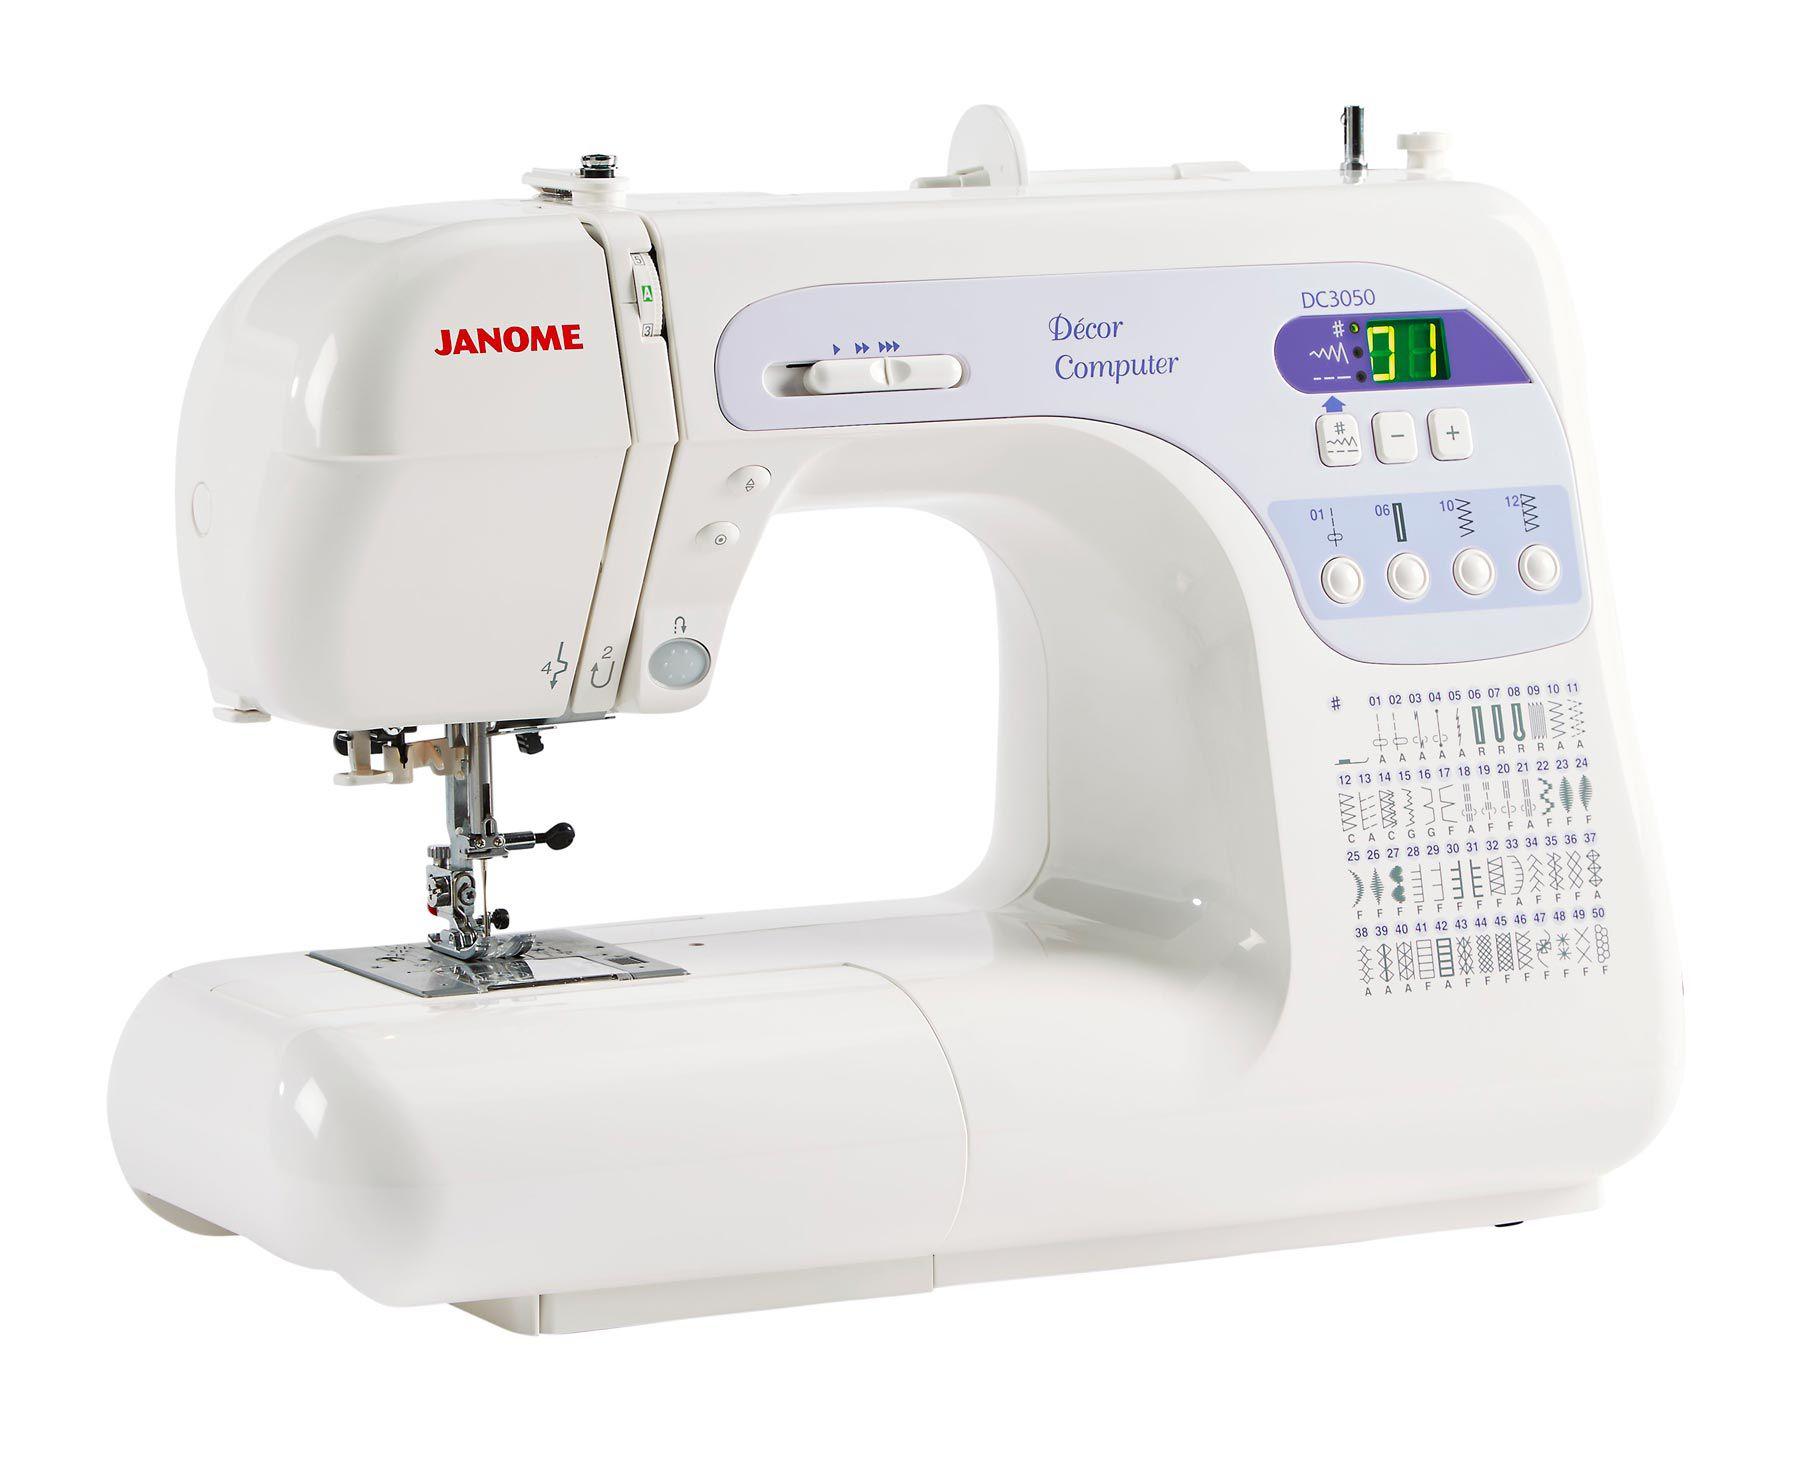 Bernina Sewing Machine Trolley Bag Uk  5f49d3b94519a